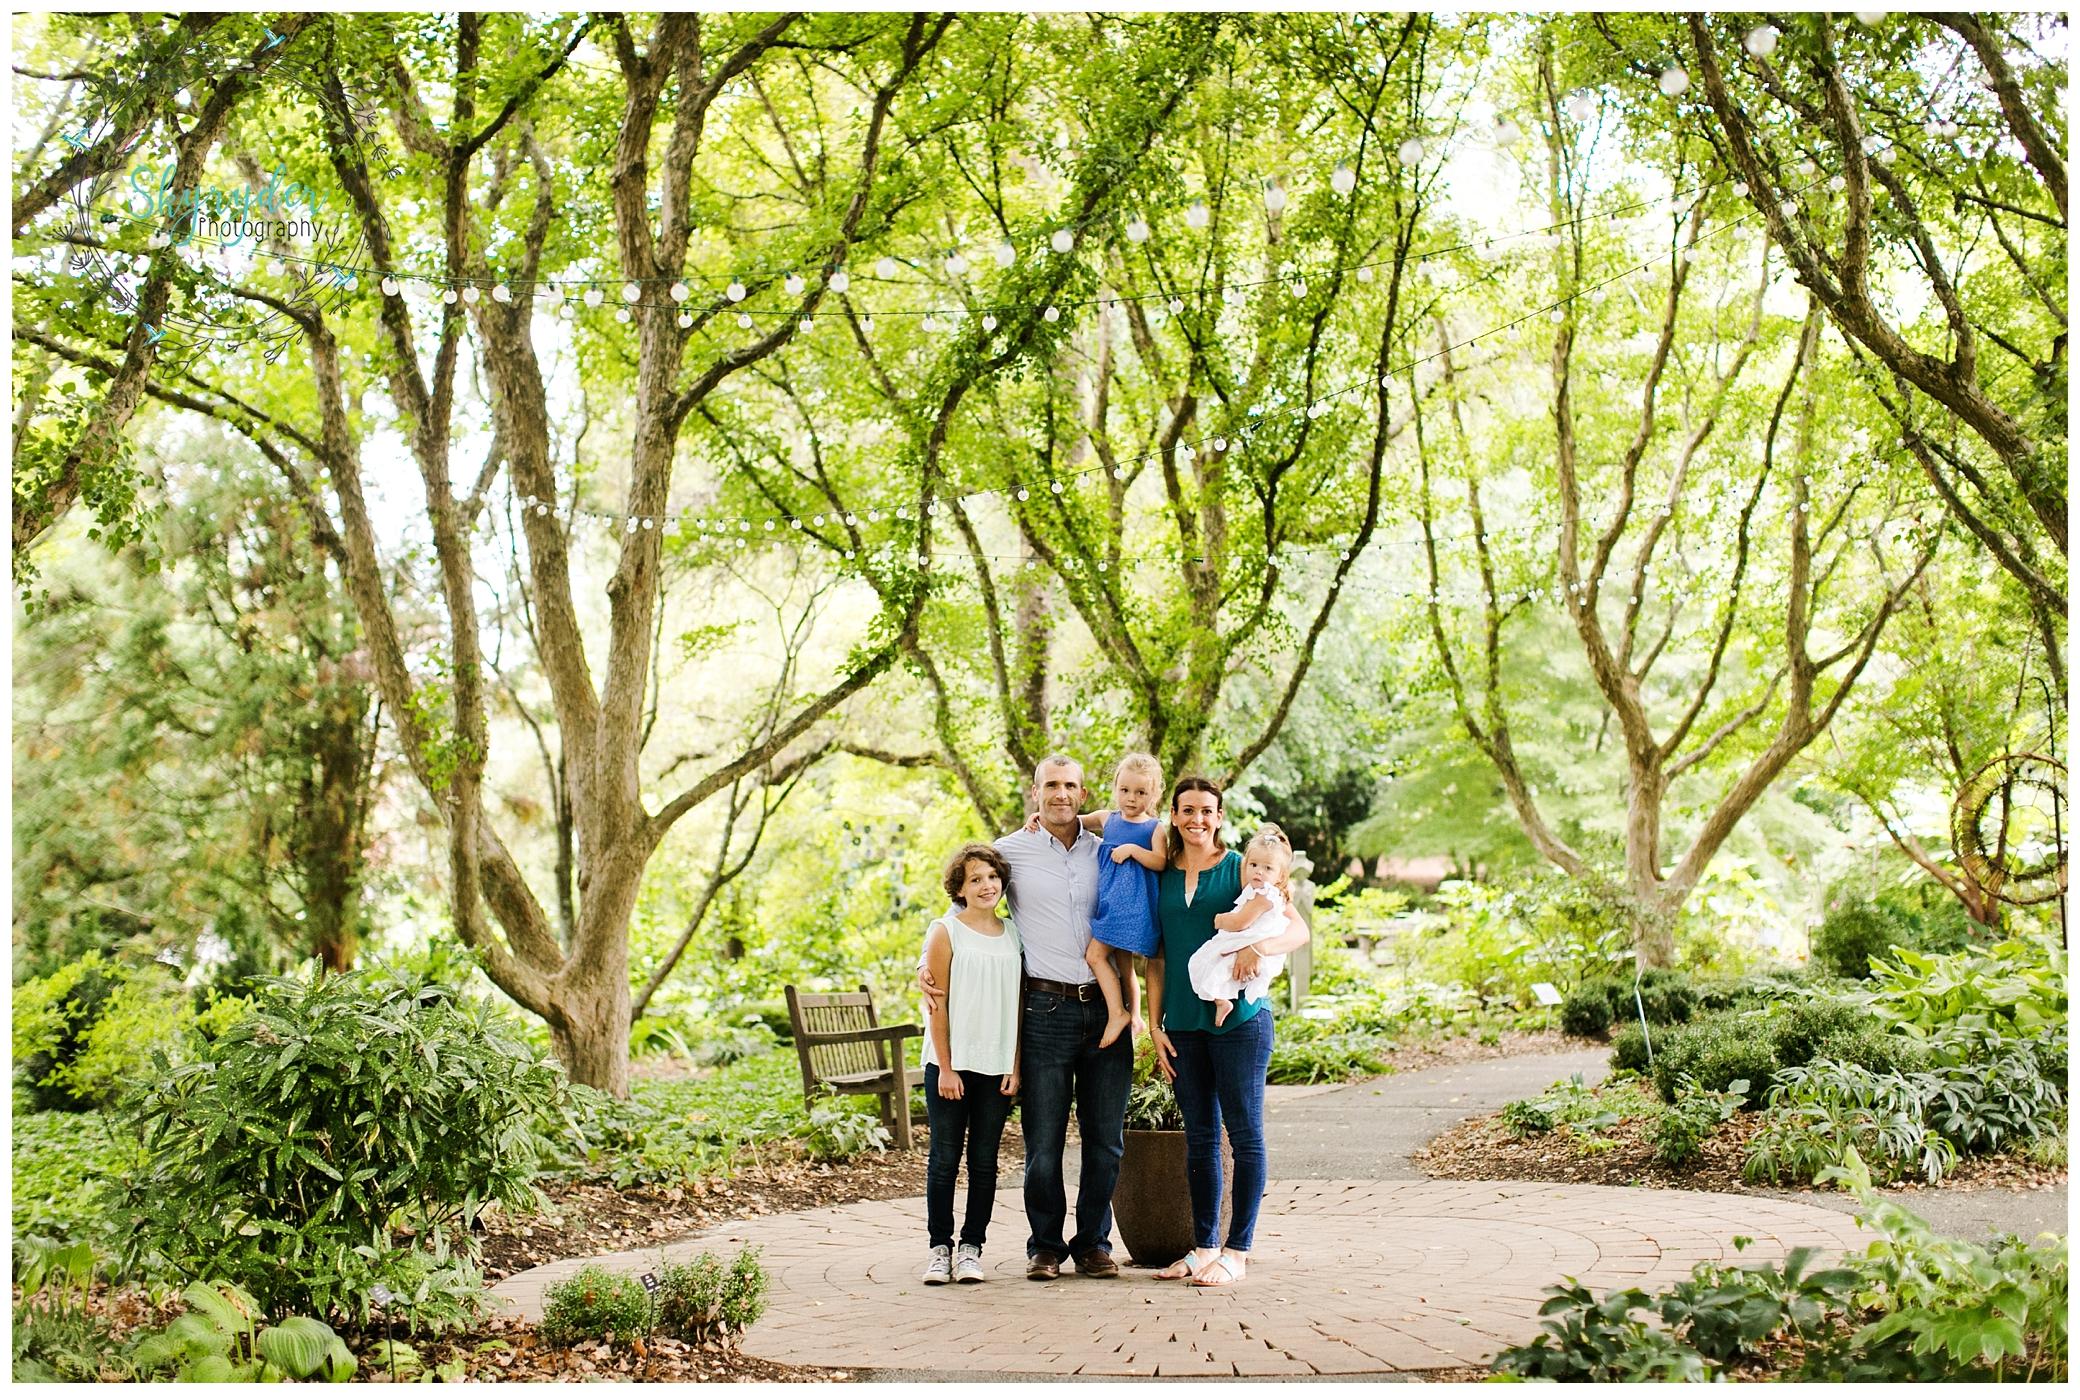 White Family | Blacksburg Family Photographer | Hahn Horticulture Garden | Virginia Tech